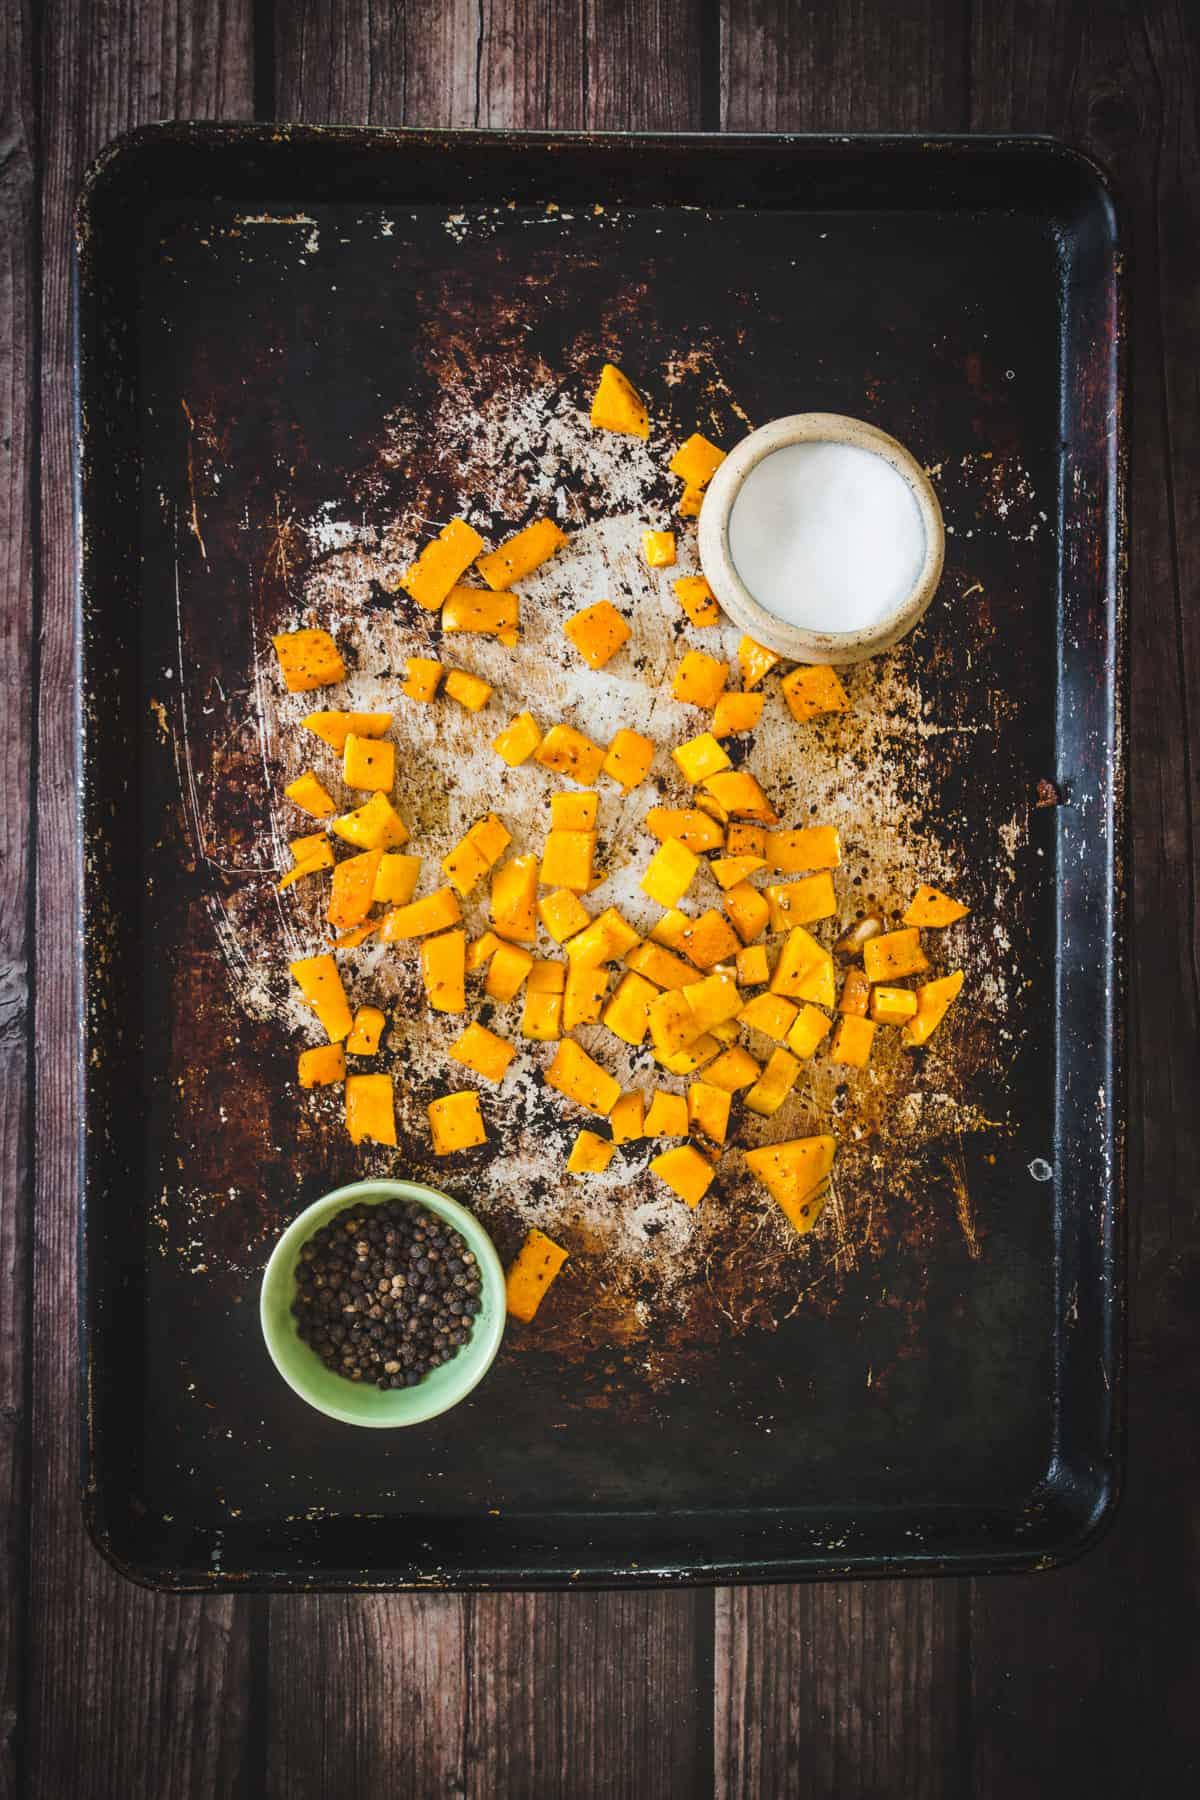 butternut squash on roasting tray